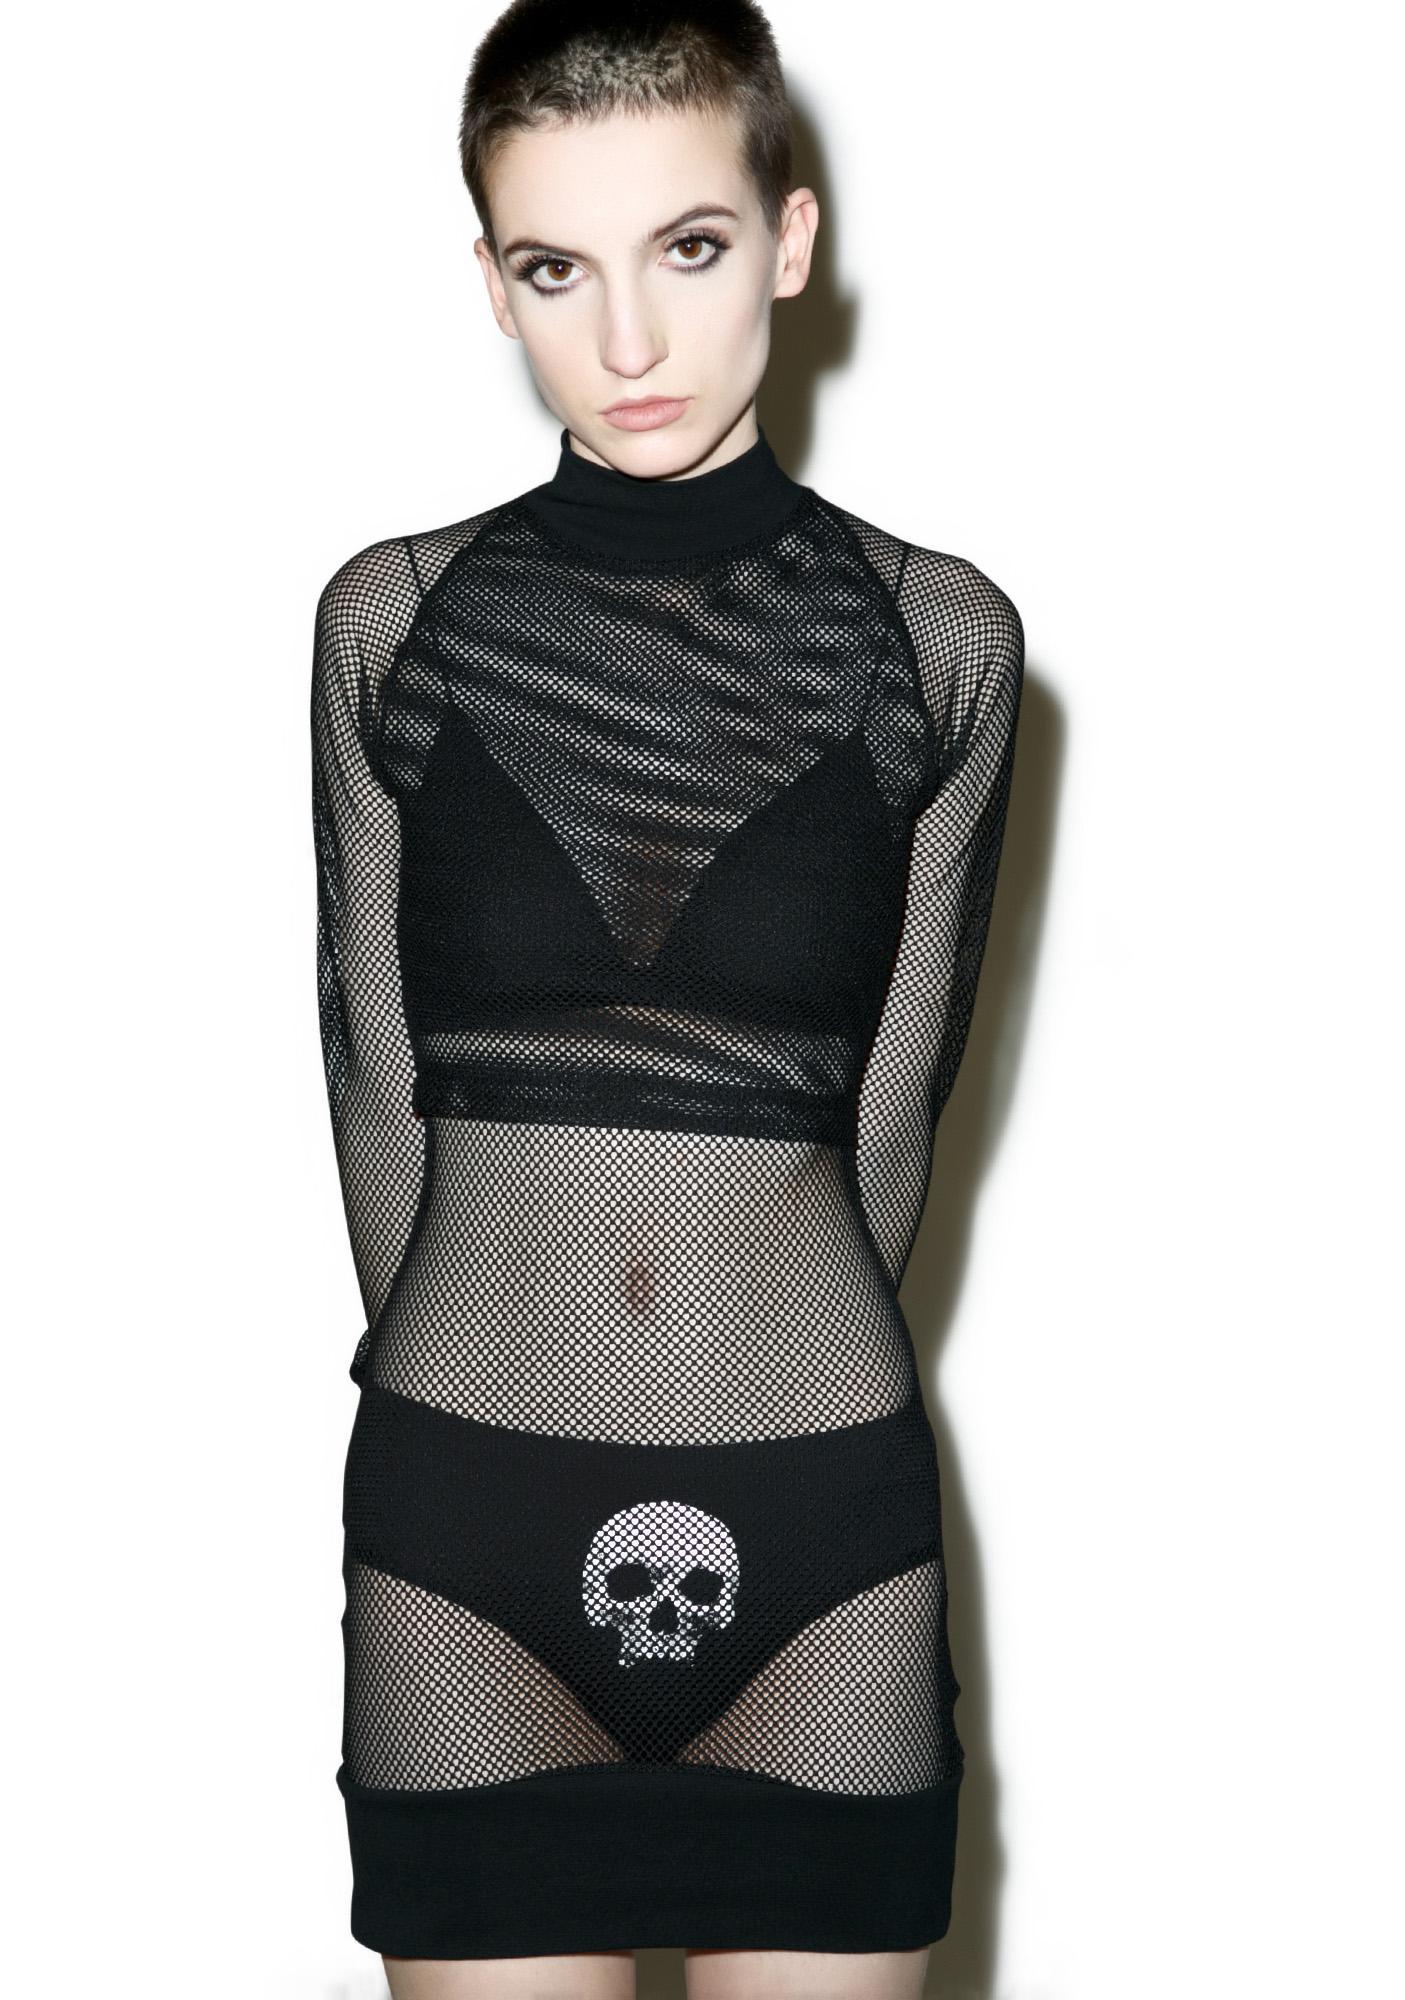 Goth Panties 109